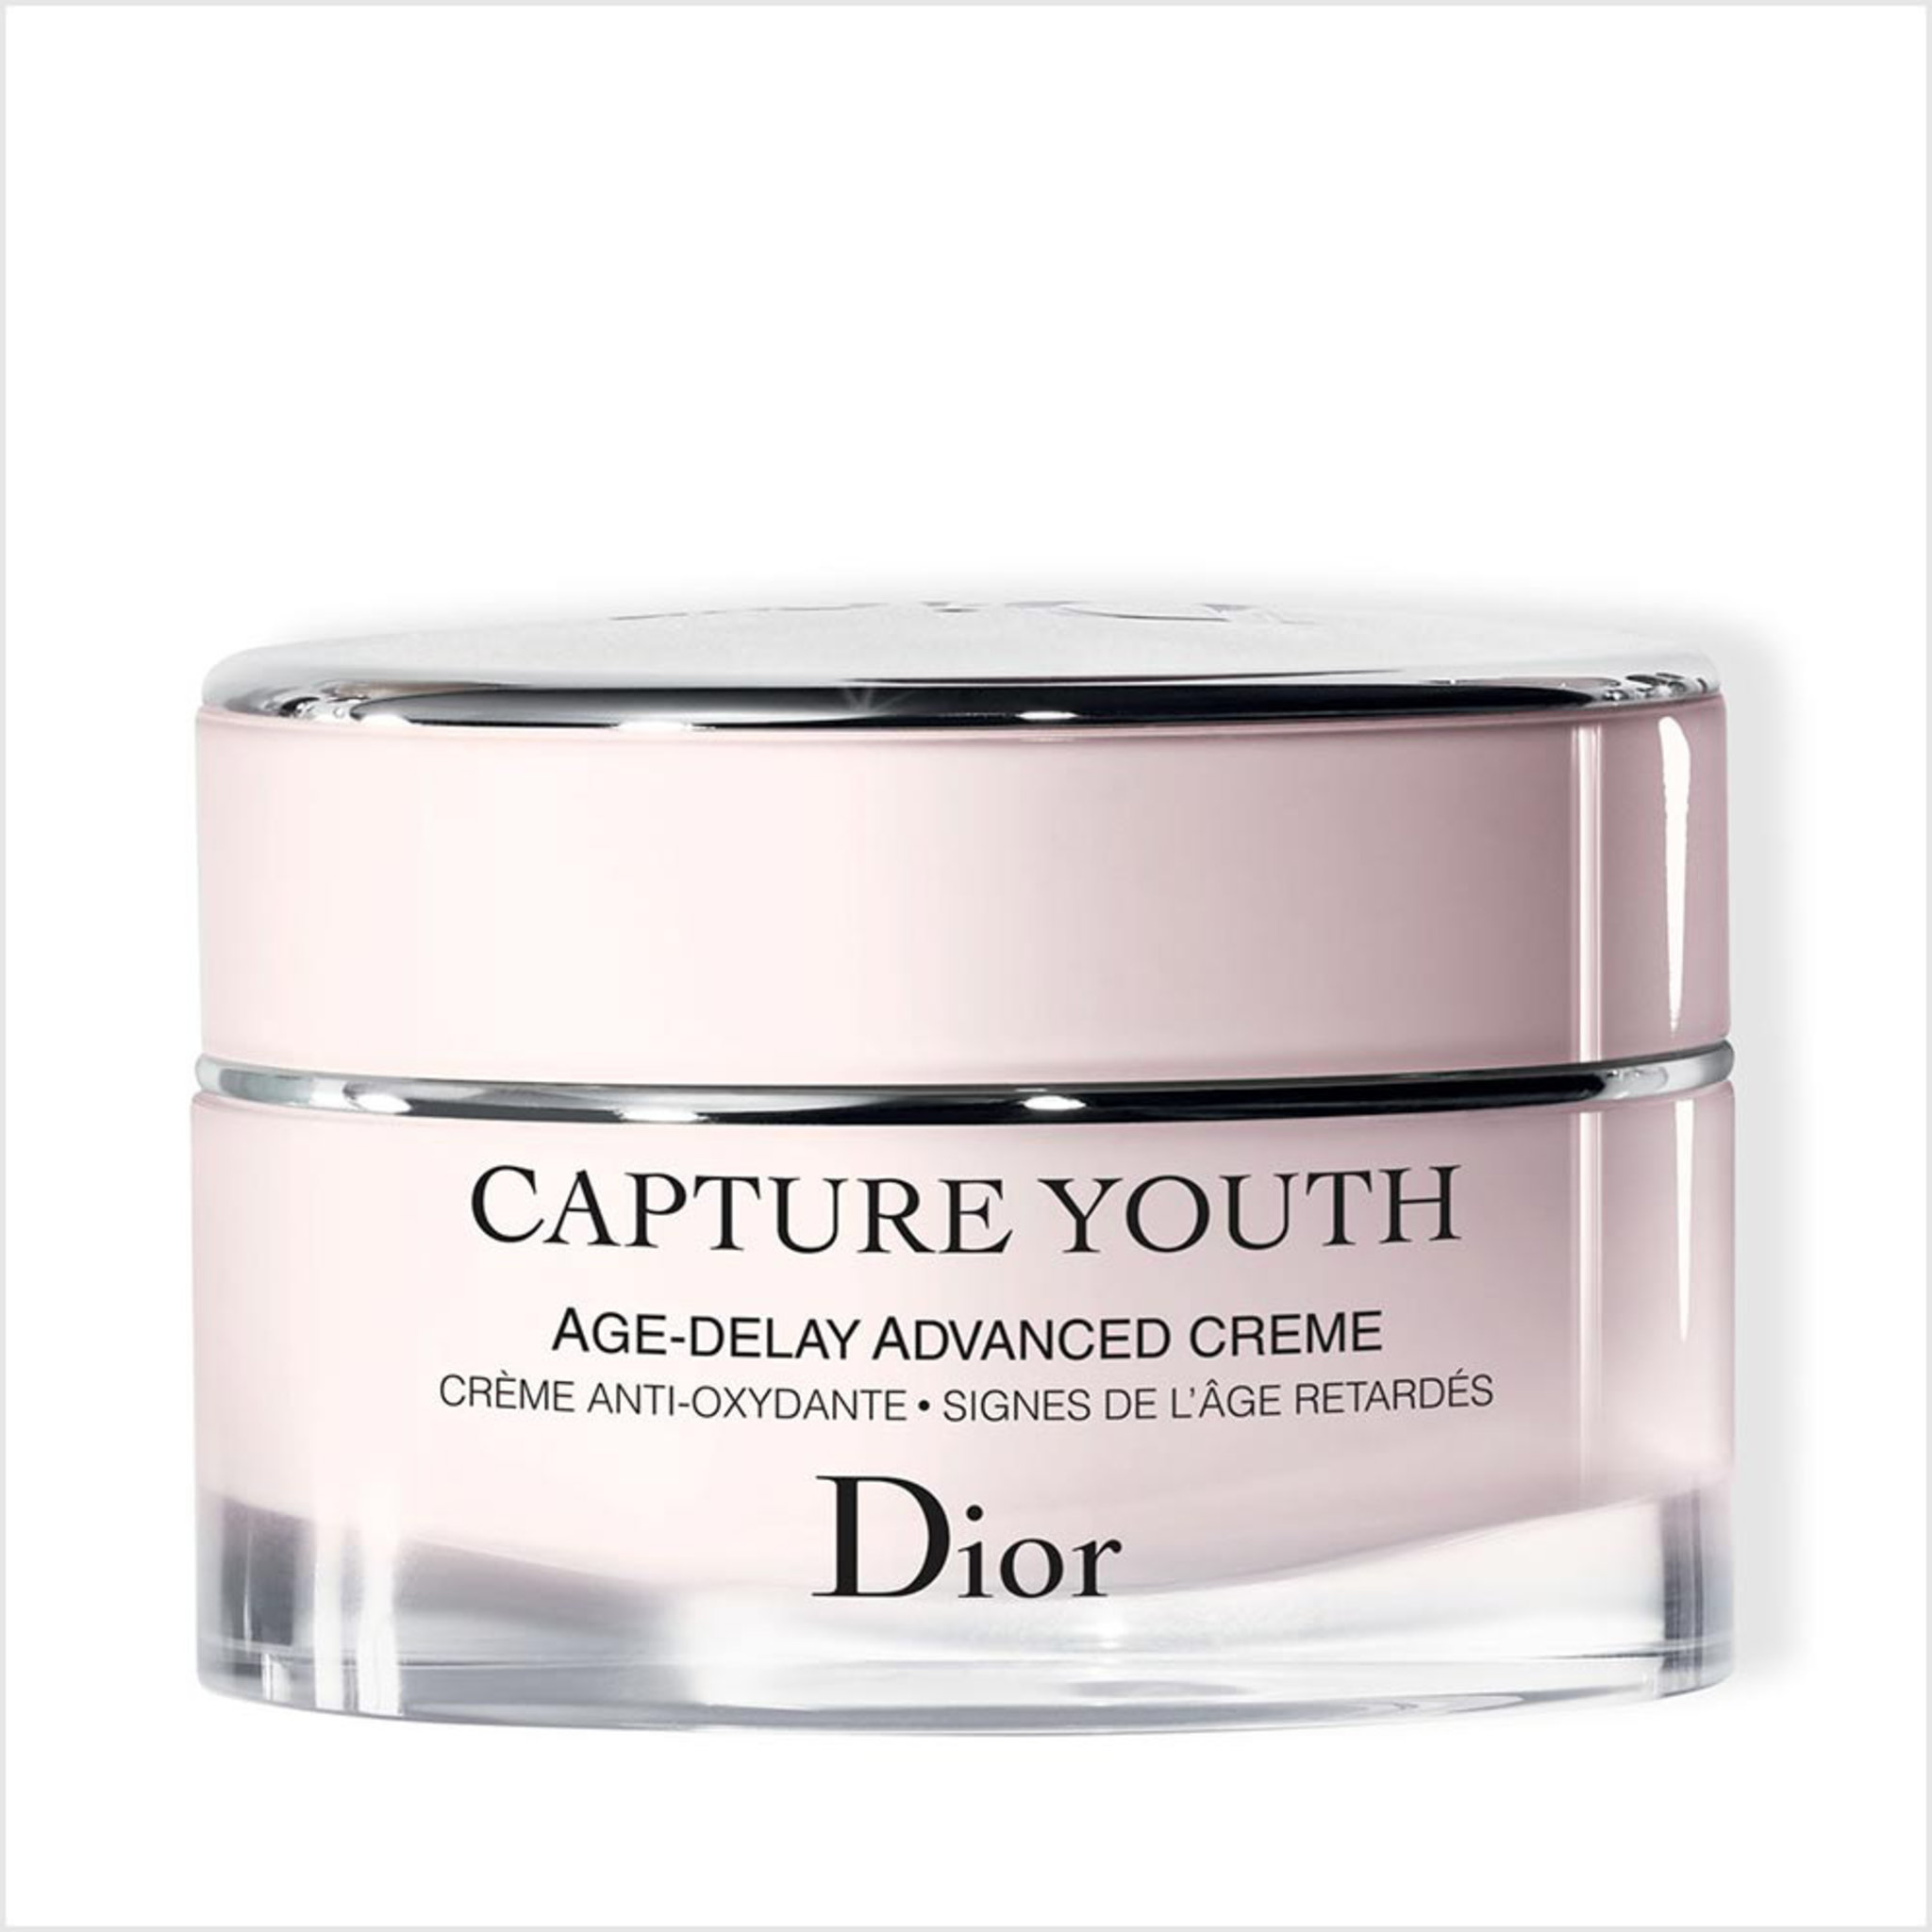 Capture Youth – Age-delay advanced crème, 50 ML